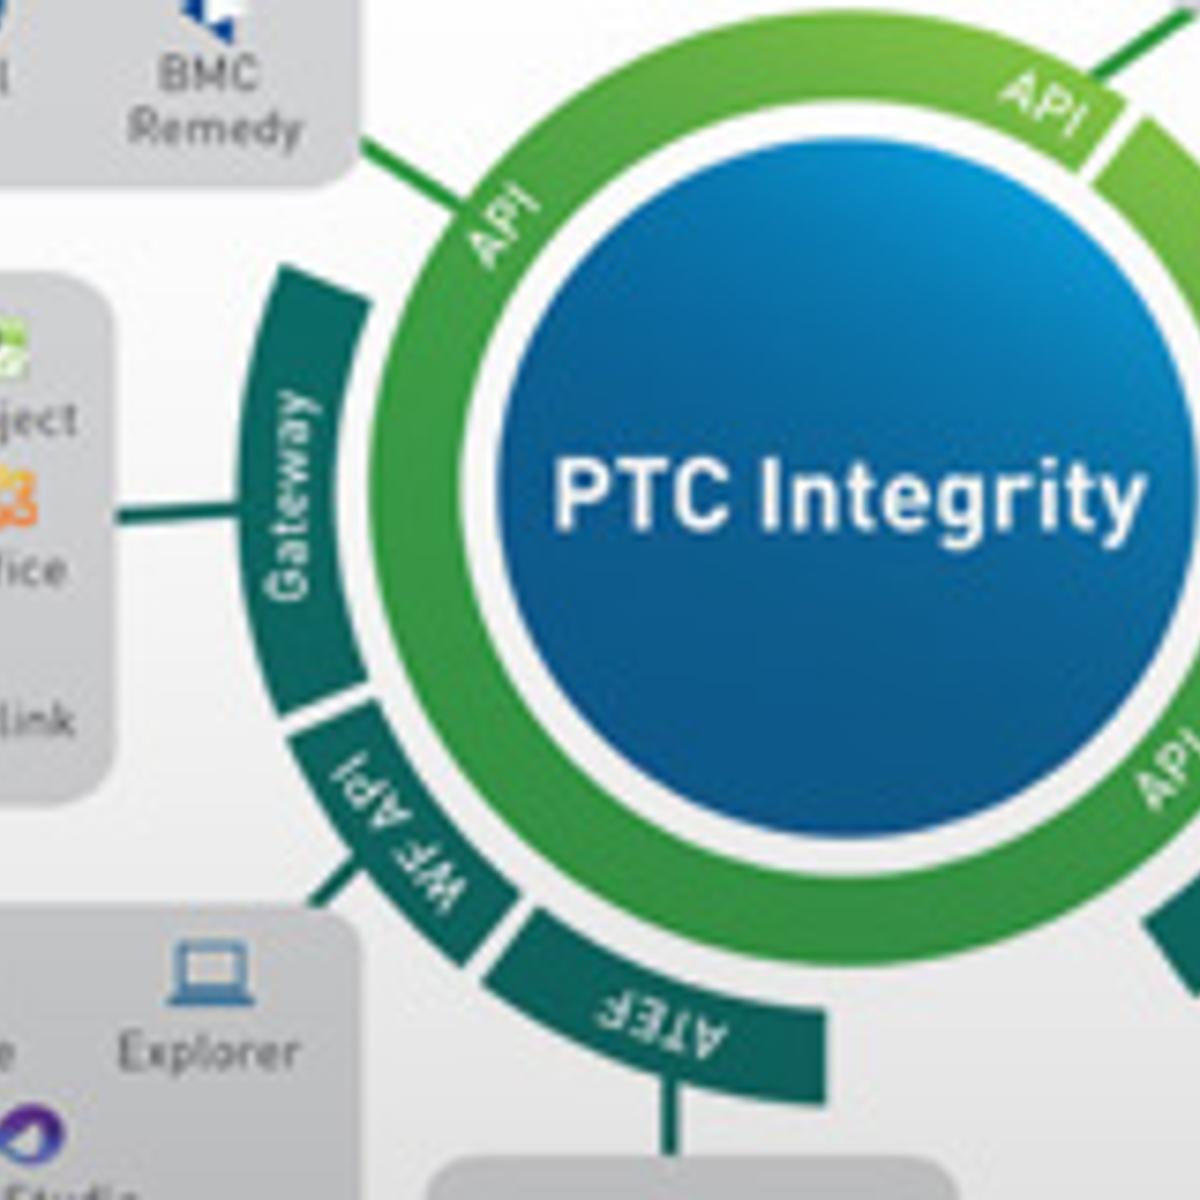 Ptc Integrity Alternatives And Similar Software